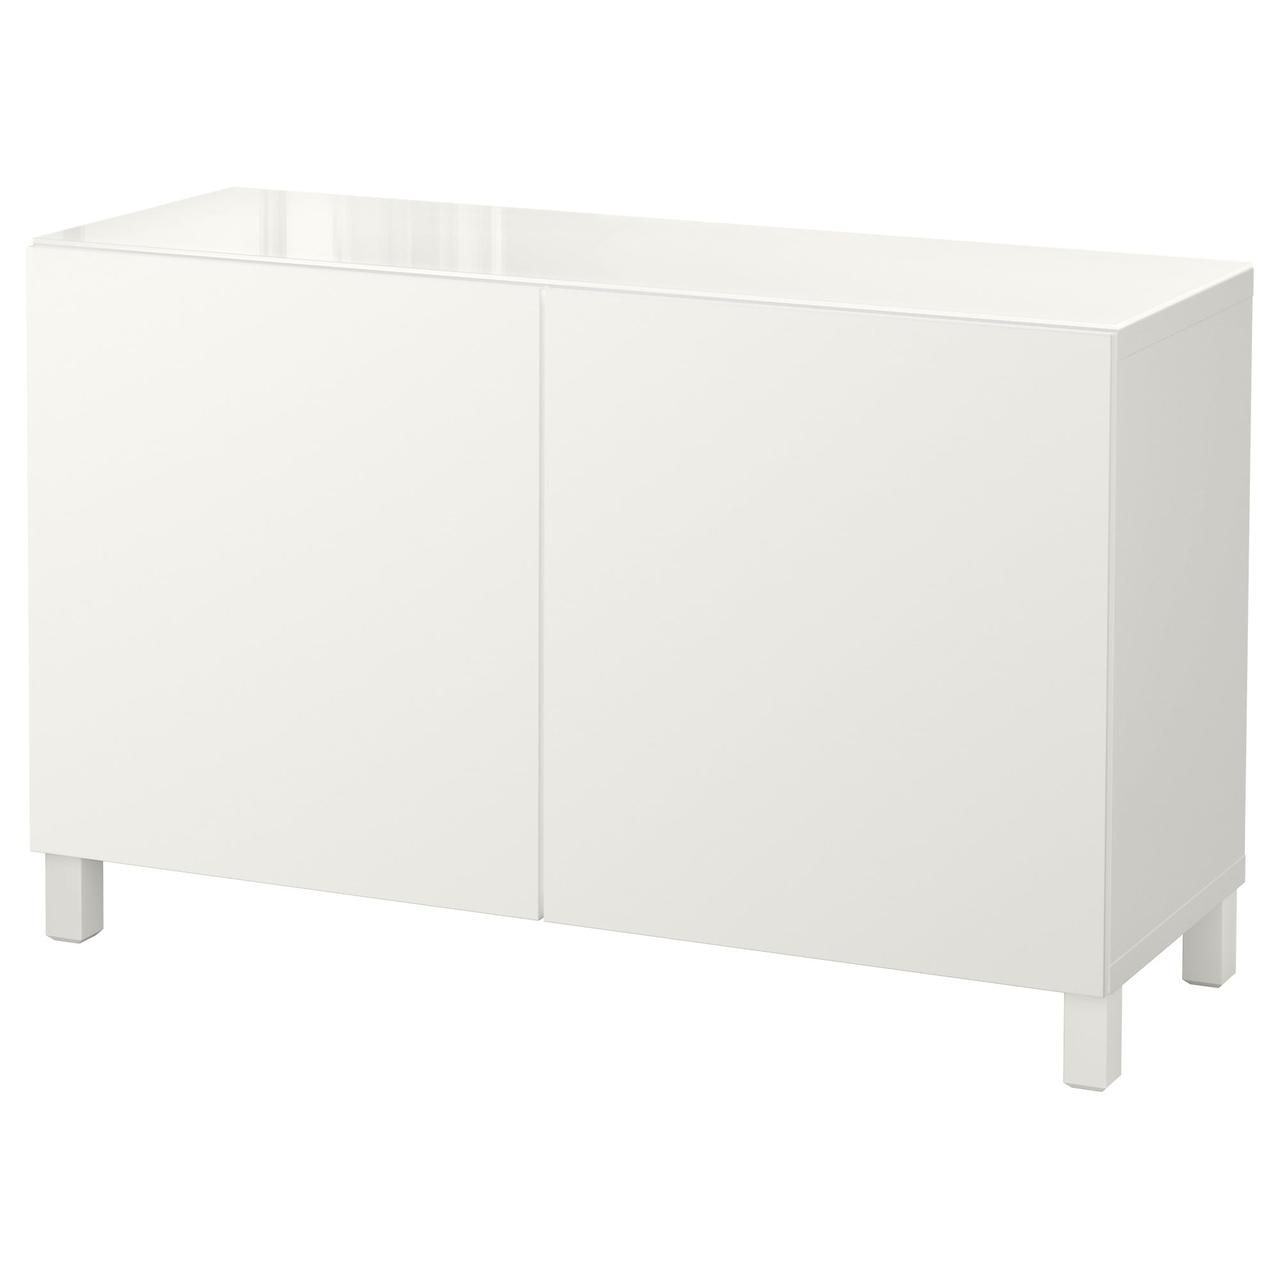 Тумба IKEA BESTÅ 120x40x74 см Lappviken белая 592.101.62